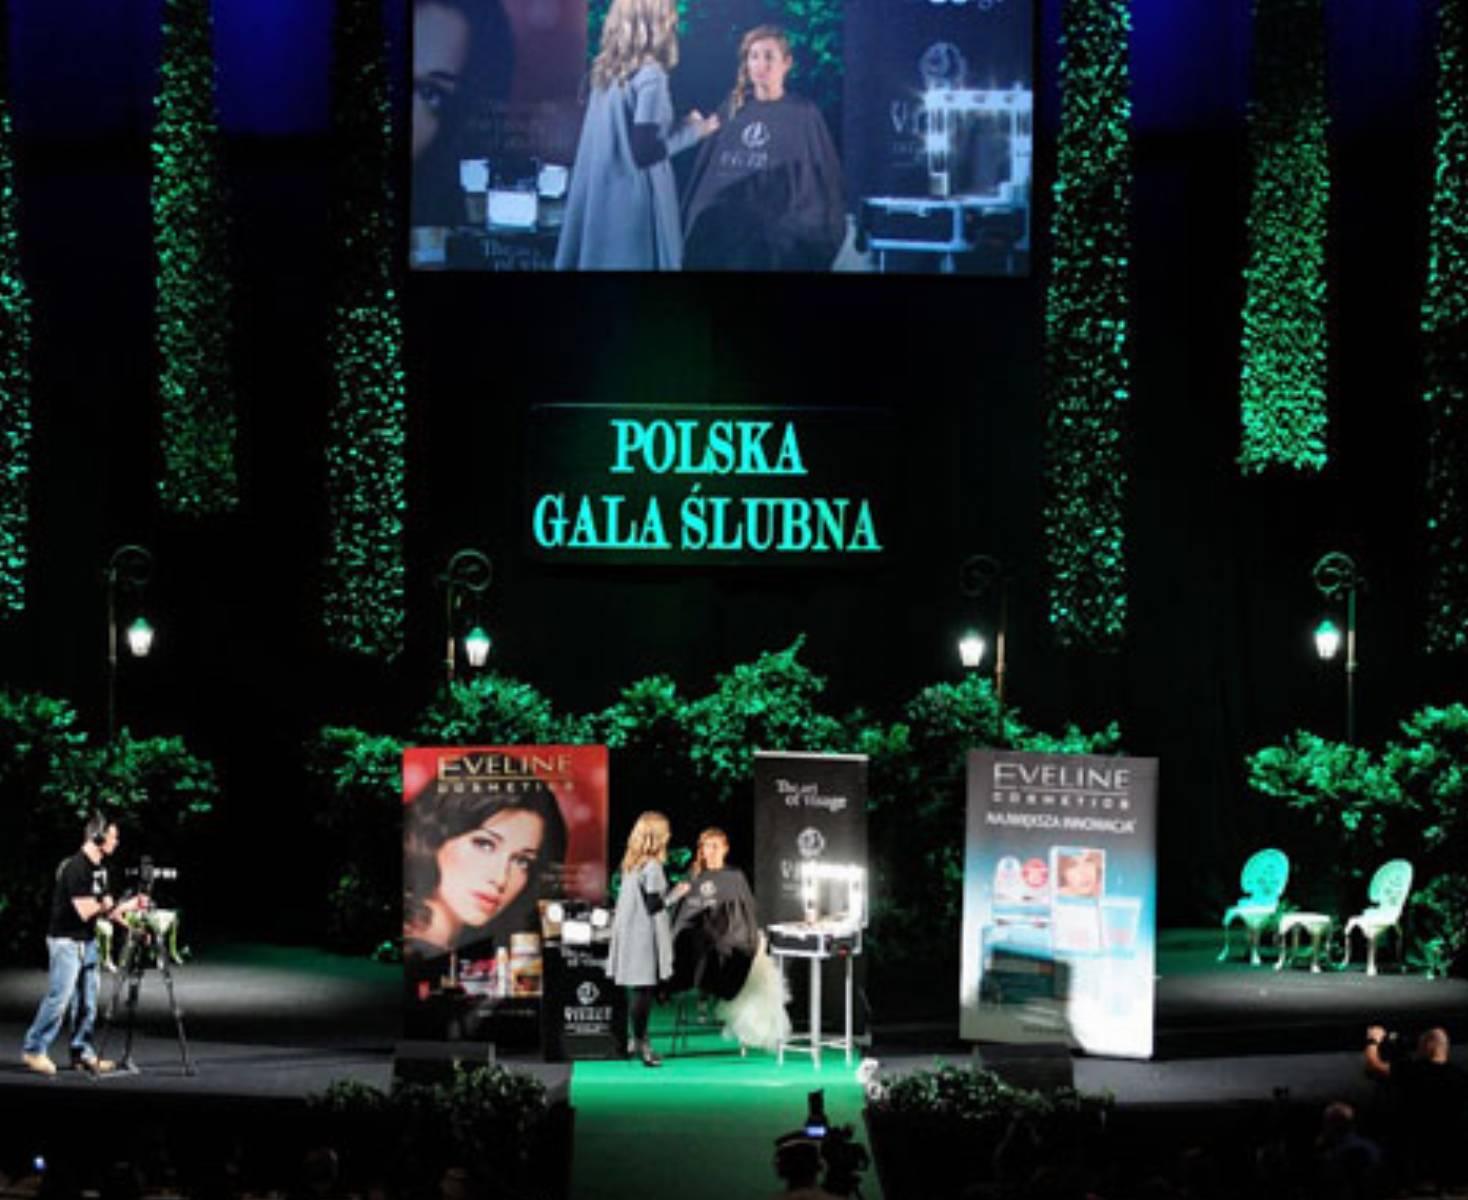 Eveline Cosmetics fot. Michal Maliszewski Polska Gala Slubna (1)